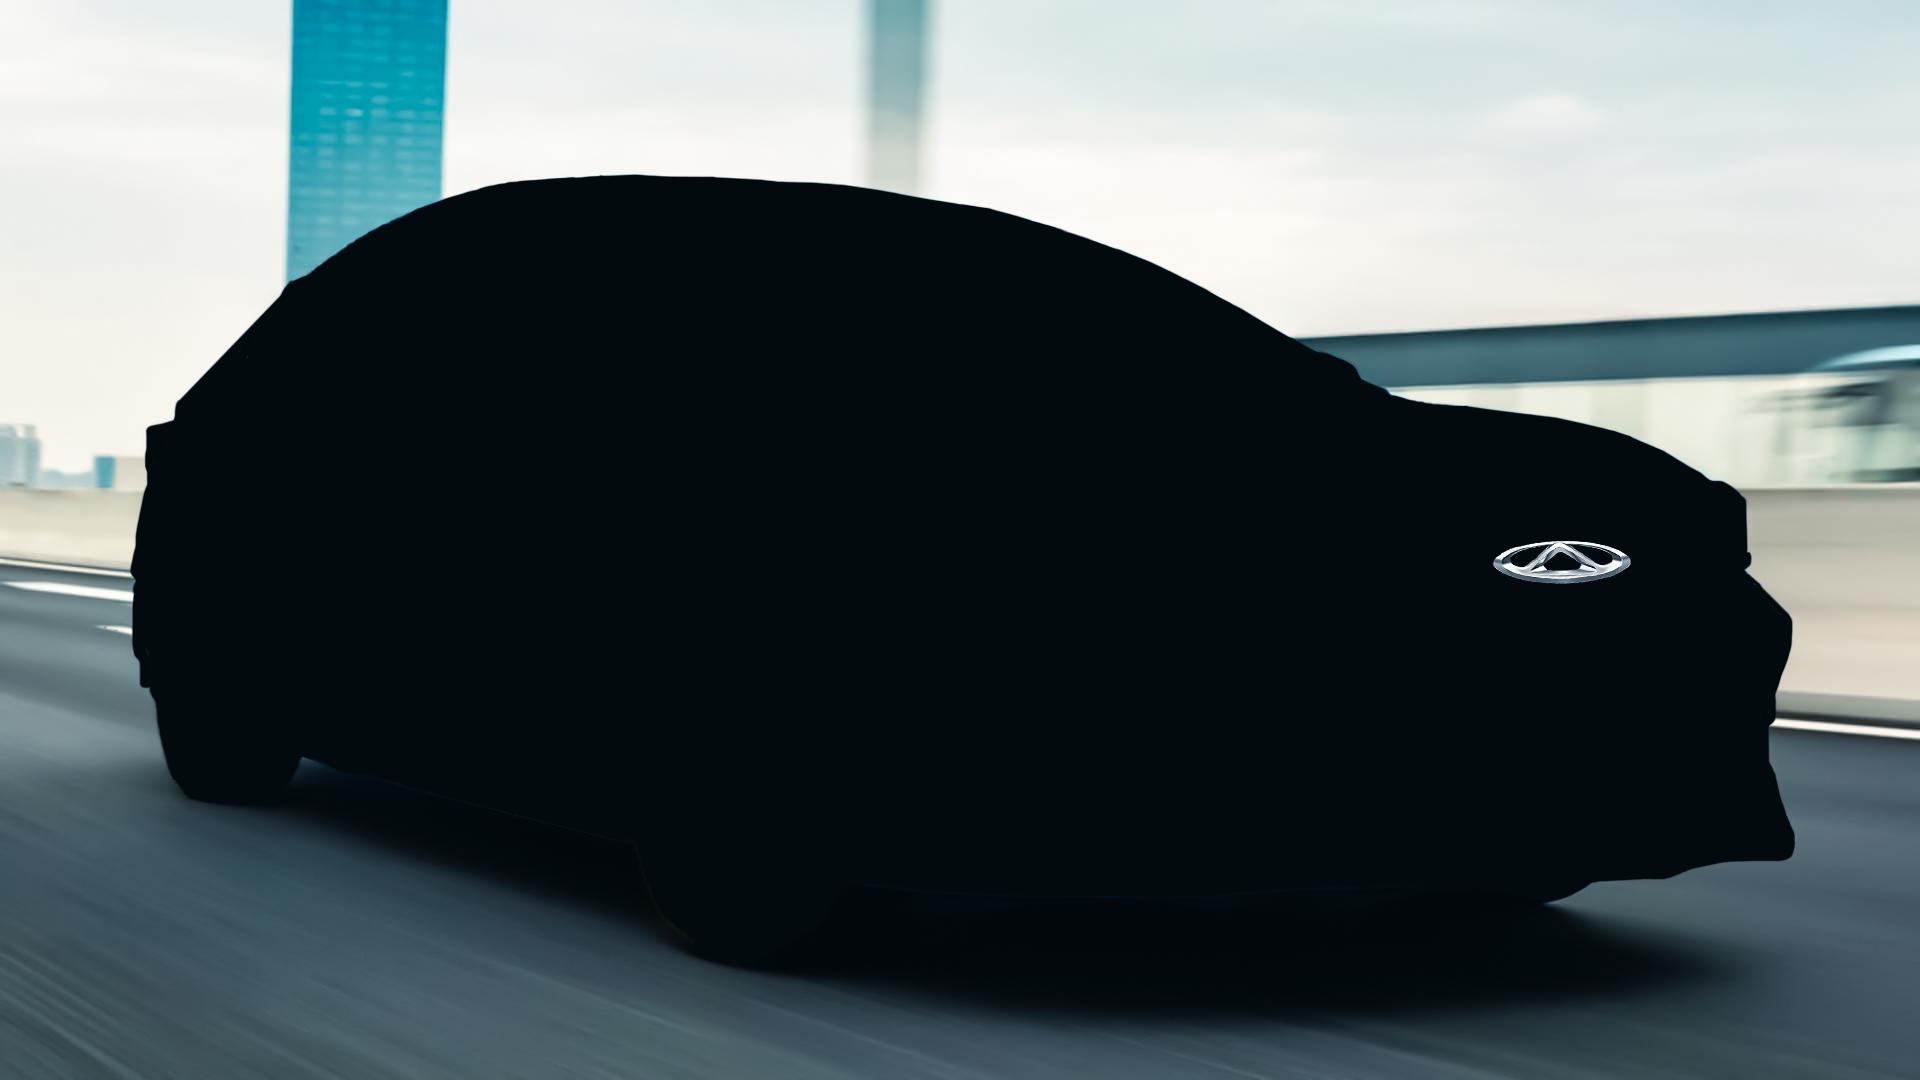 Novo sedan da Caoa Chery vai utilizar a plataforma do Arrizo 6